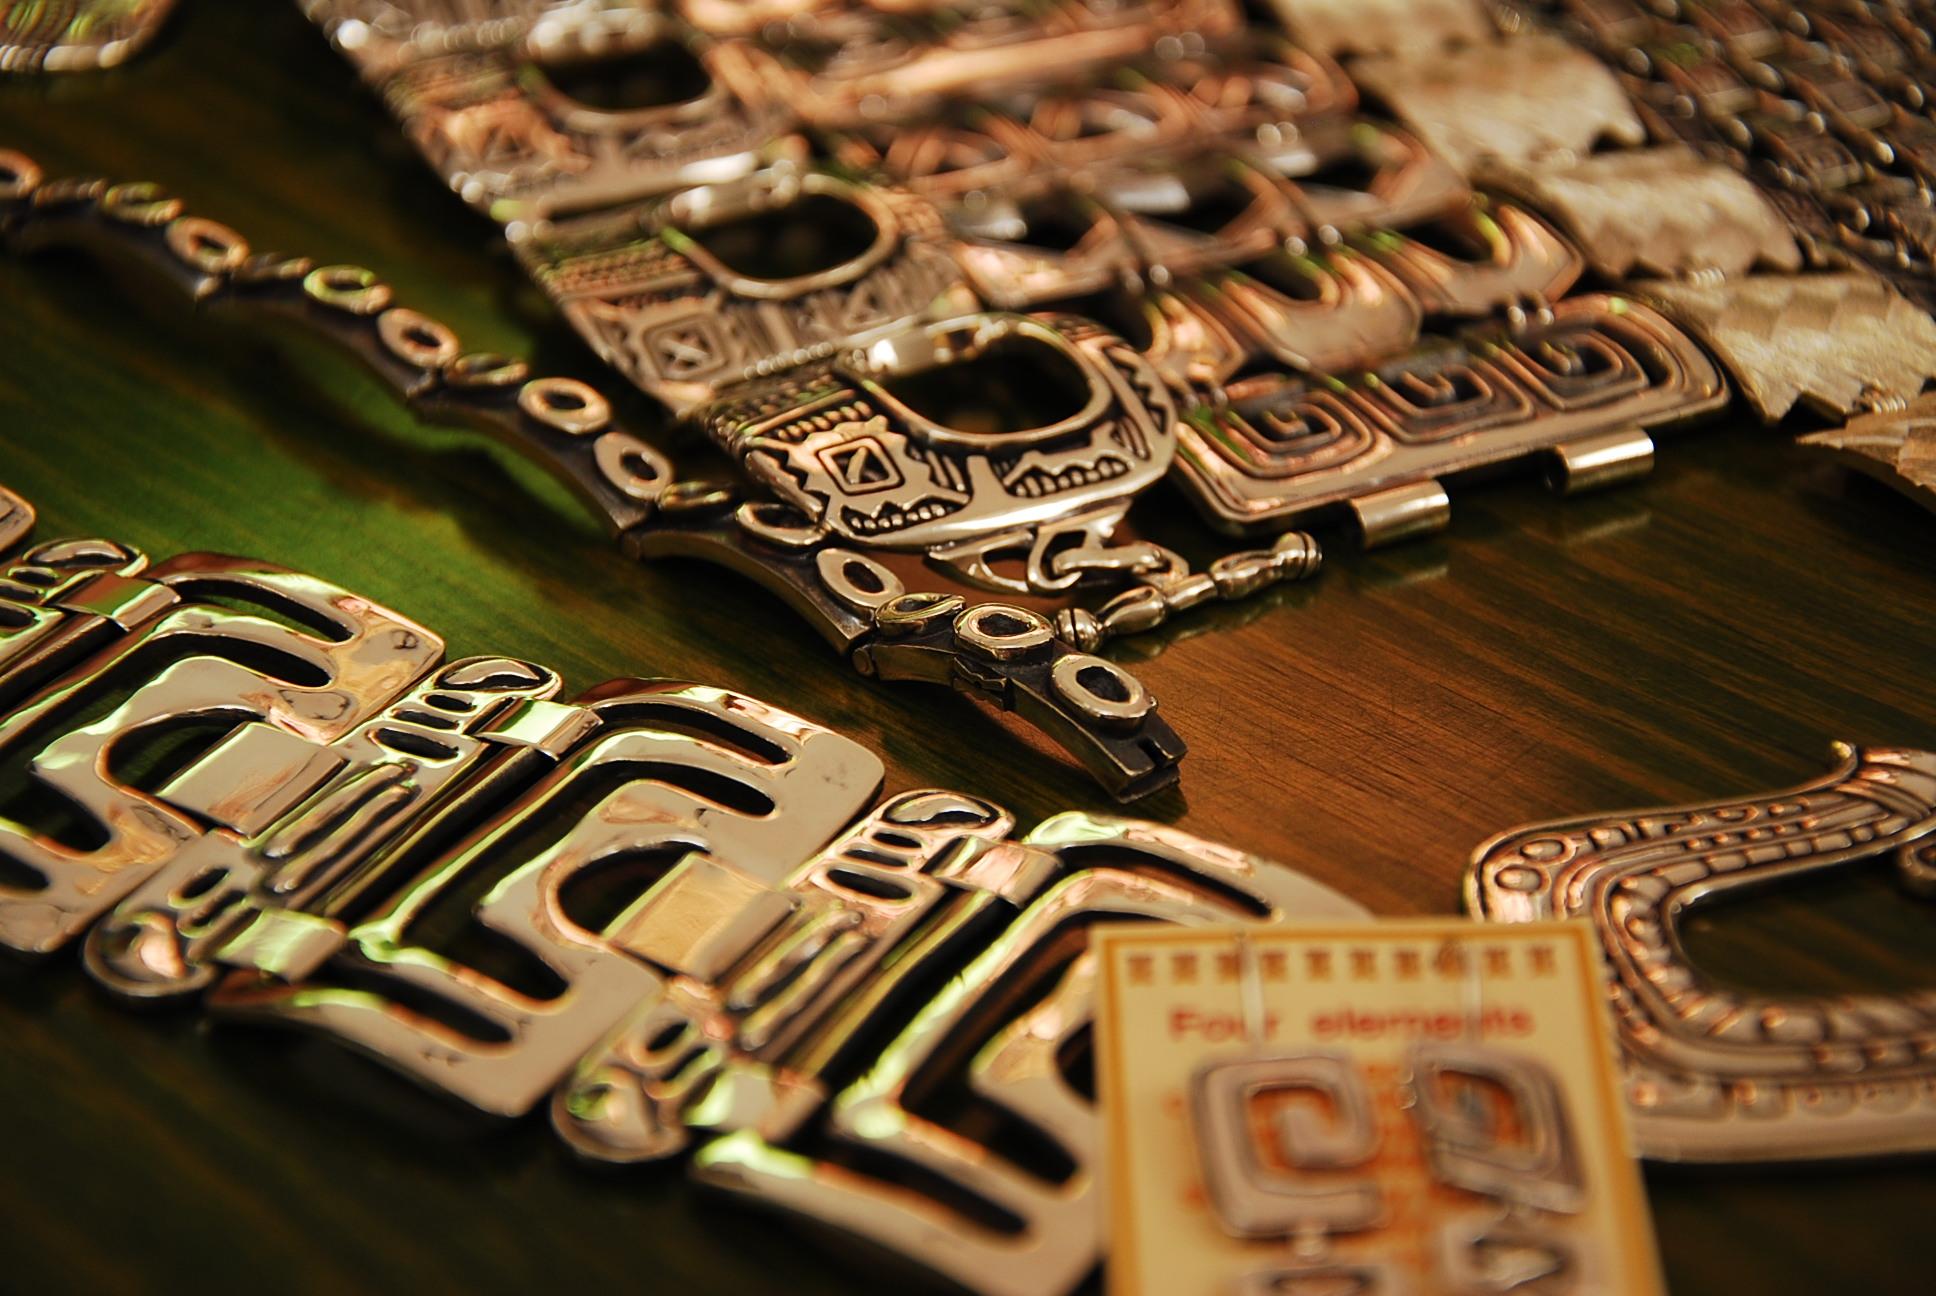 Oaxaca Silver Jewelry Designer To Show In North Carolina